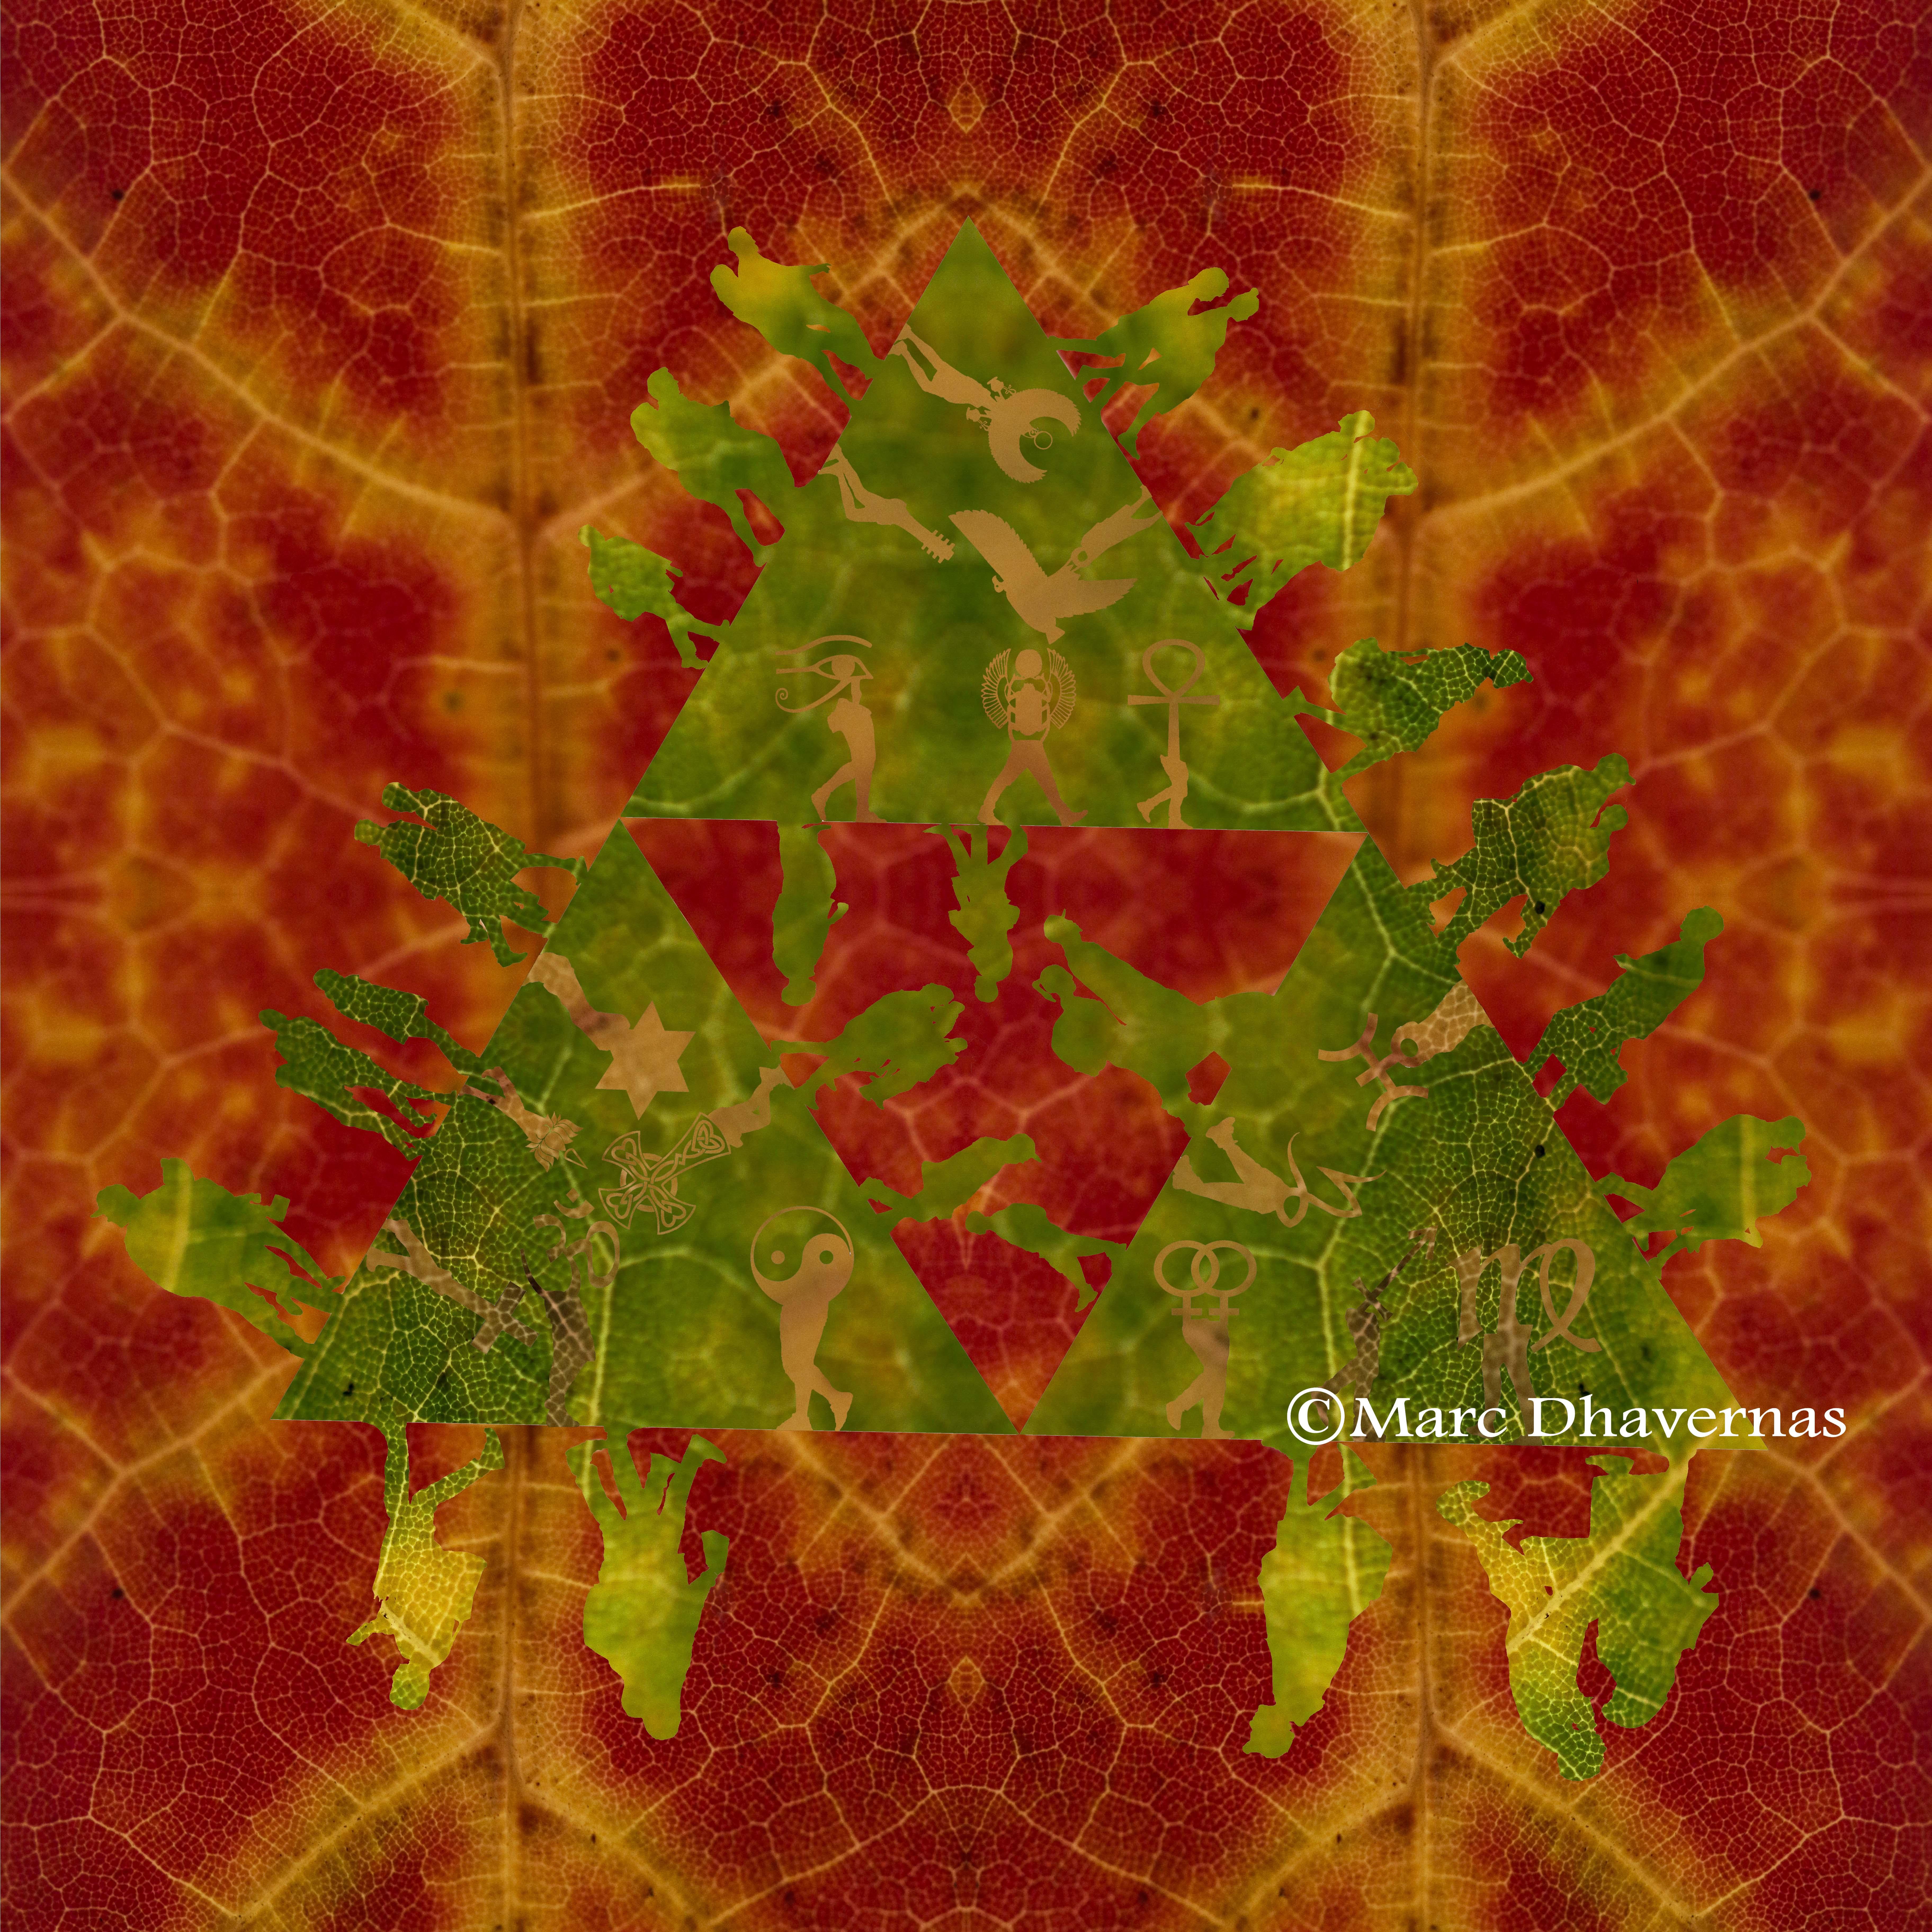 November 4 Leaf texture graffic 18- 250 zoom & 100 macro